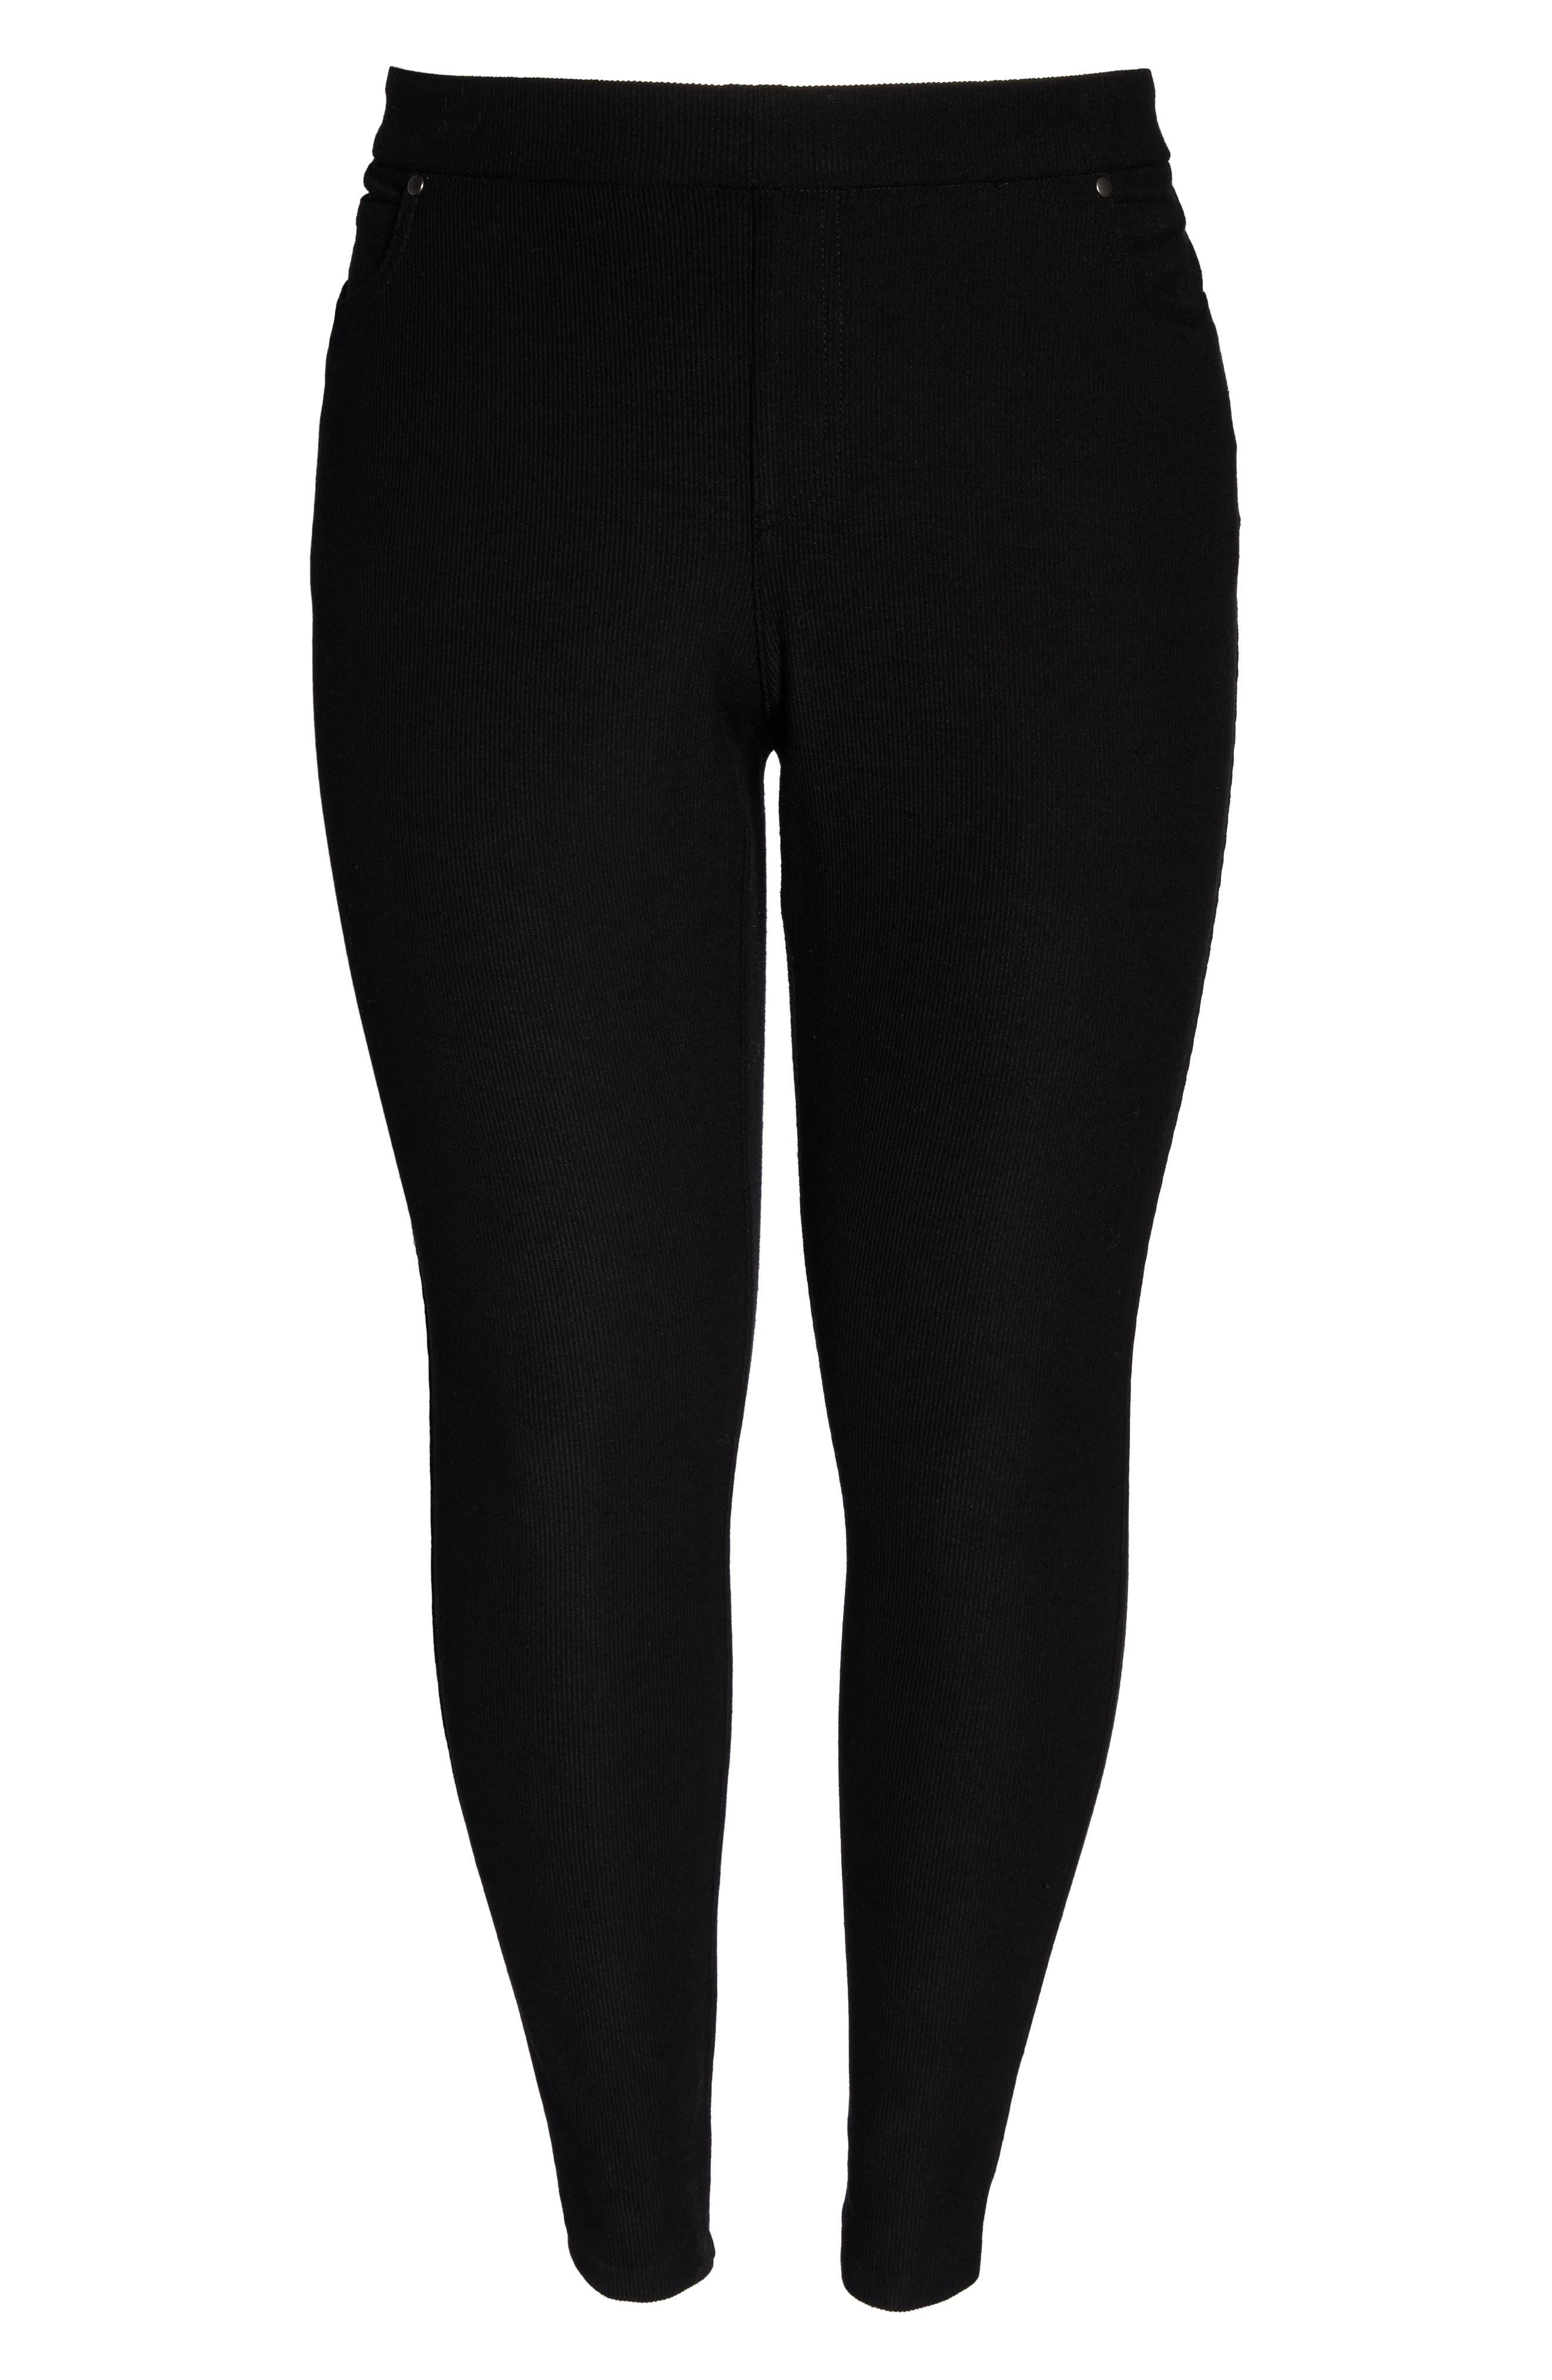 5-Pocket Skinny Pants,                             Alternate thumbnail 7, color,                             BLACK